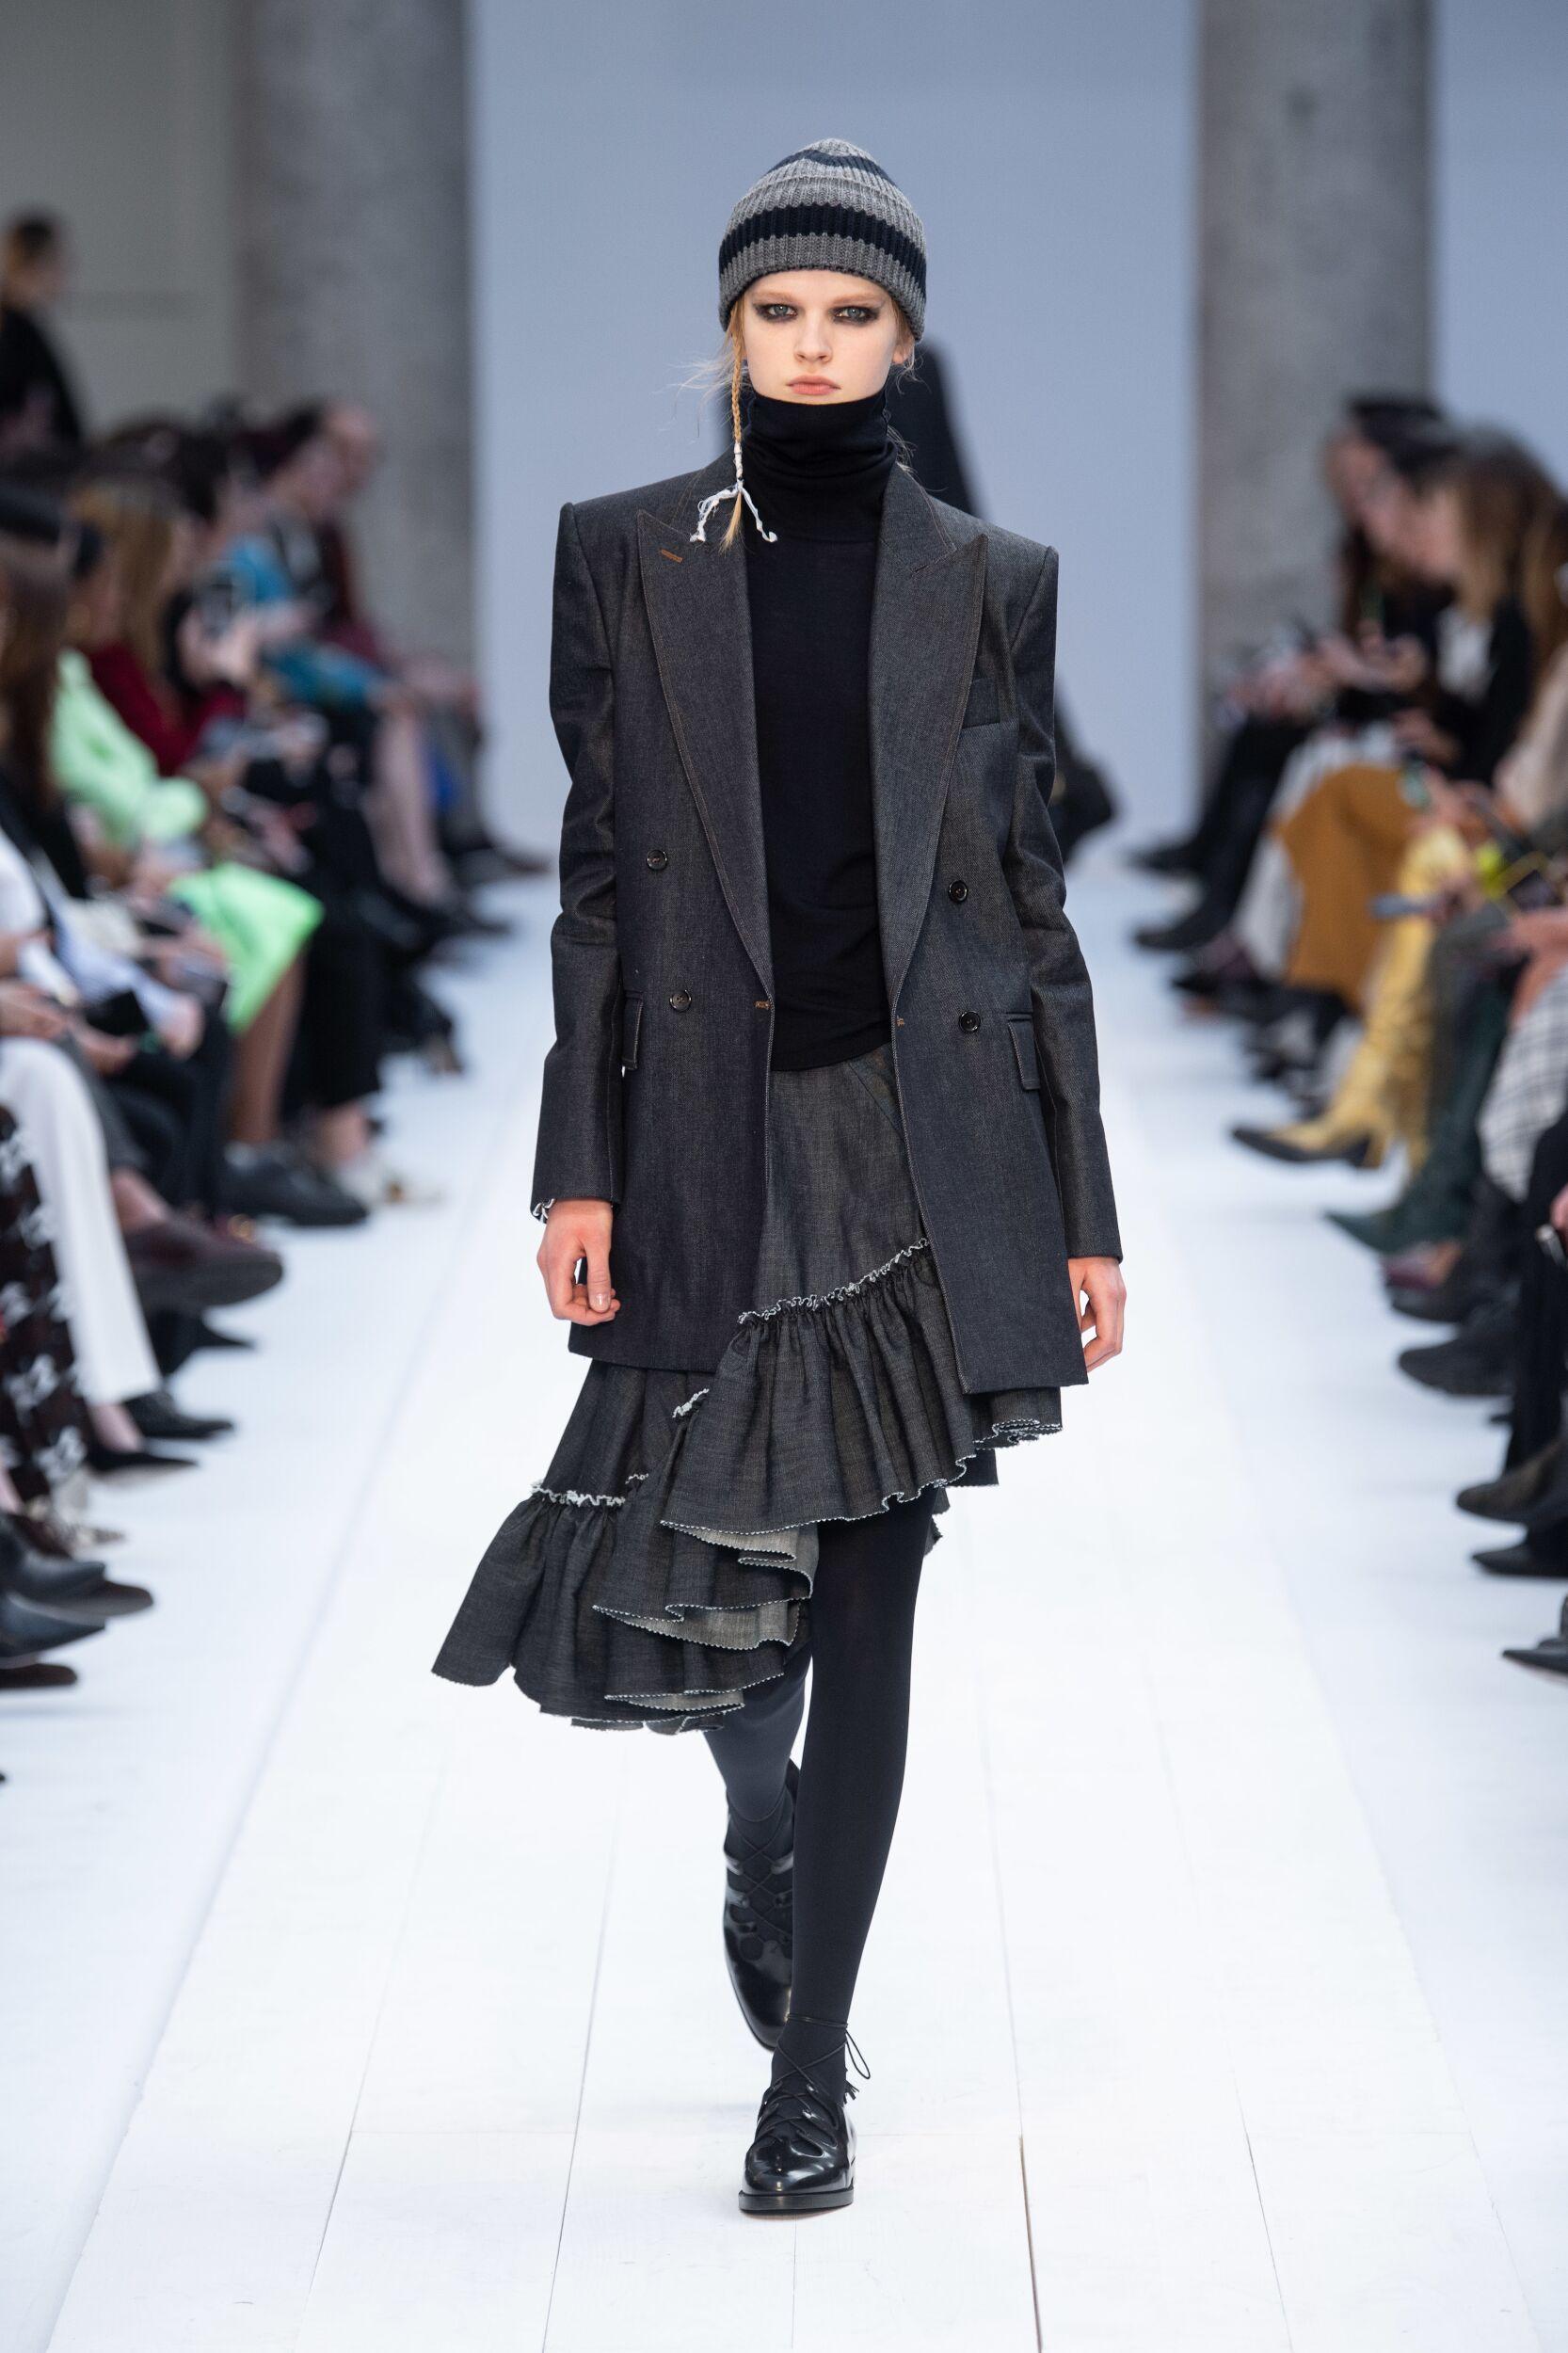 Fashion Show Woman Model Max Mara Catwalk